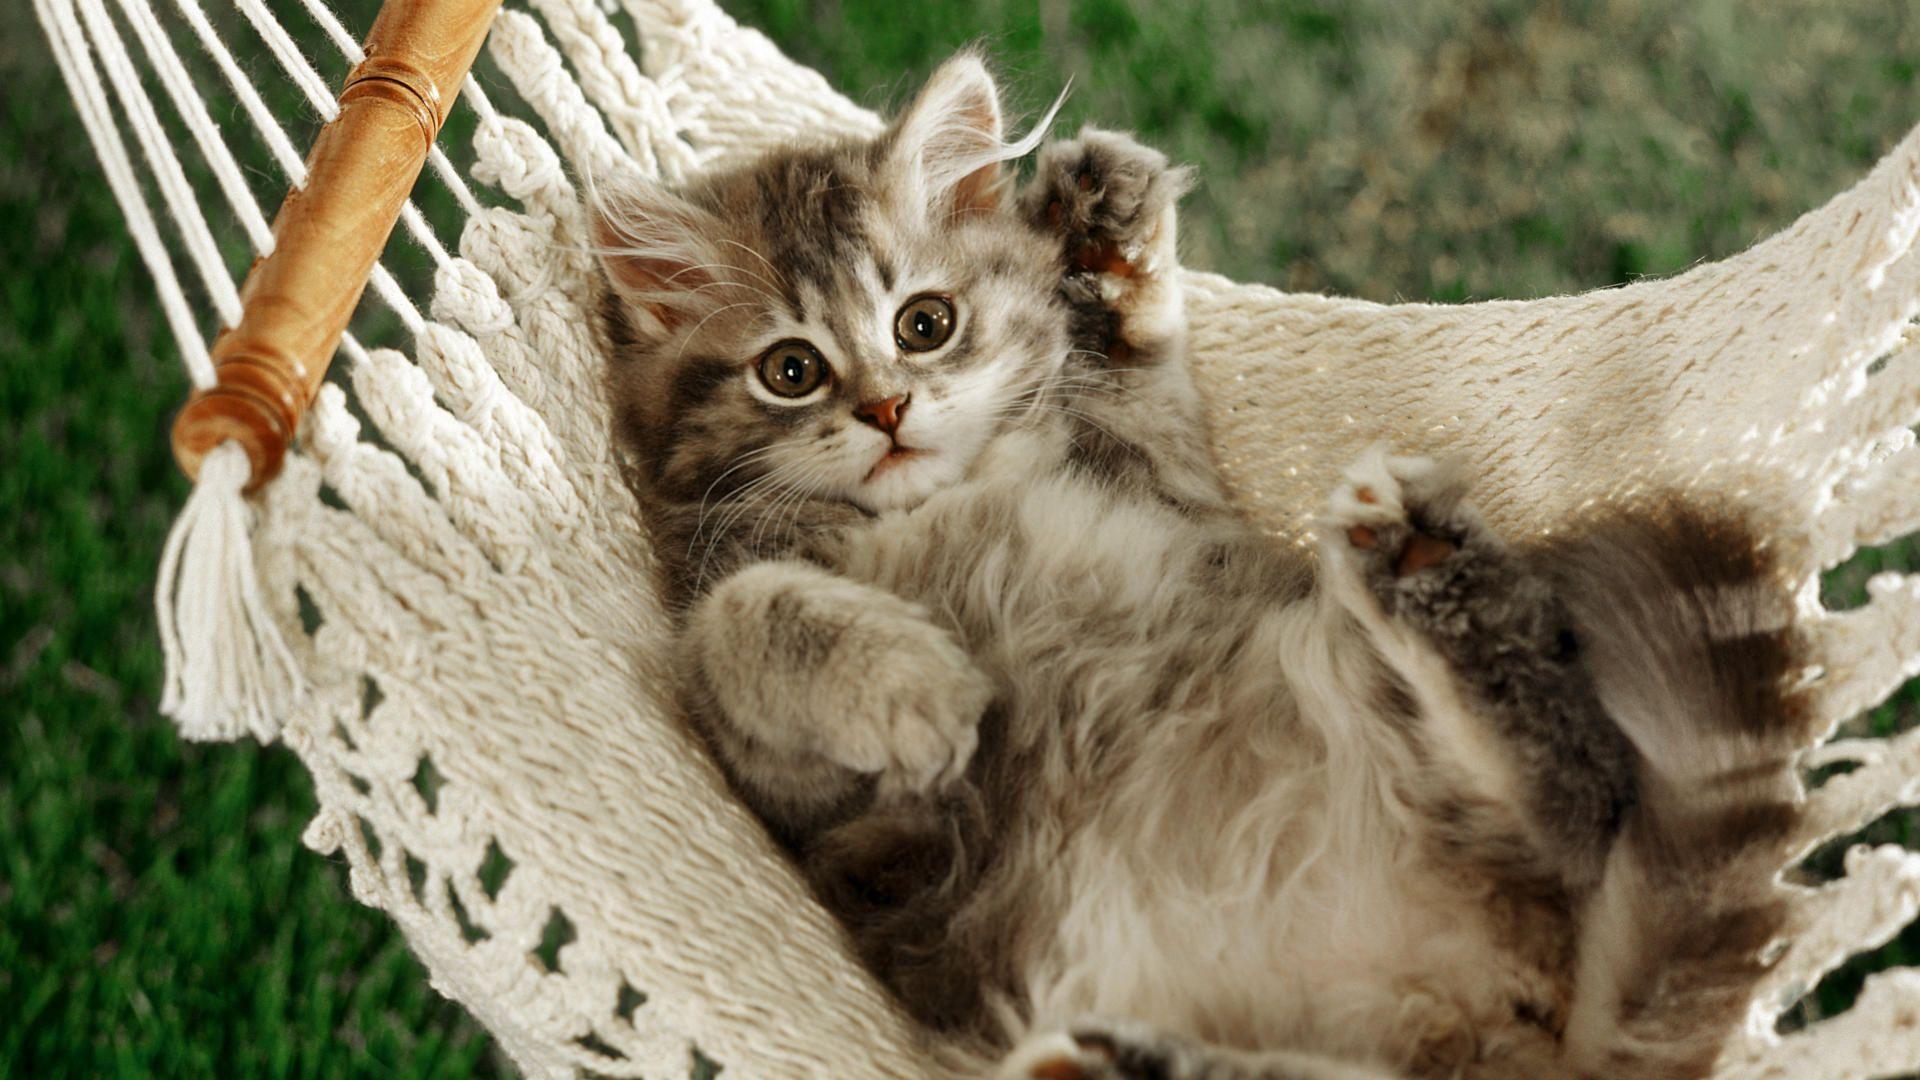 Pictures On The Desktop Kitties